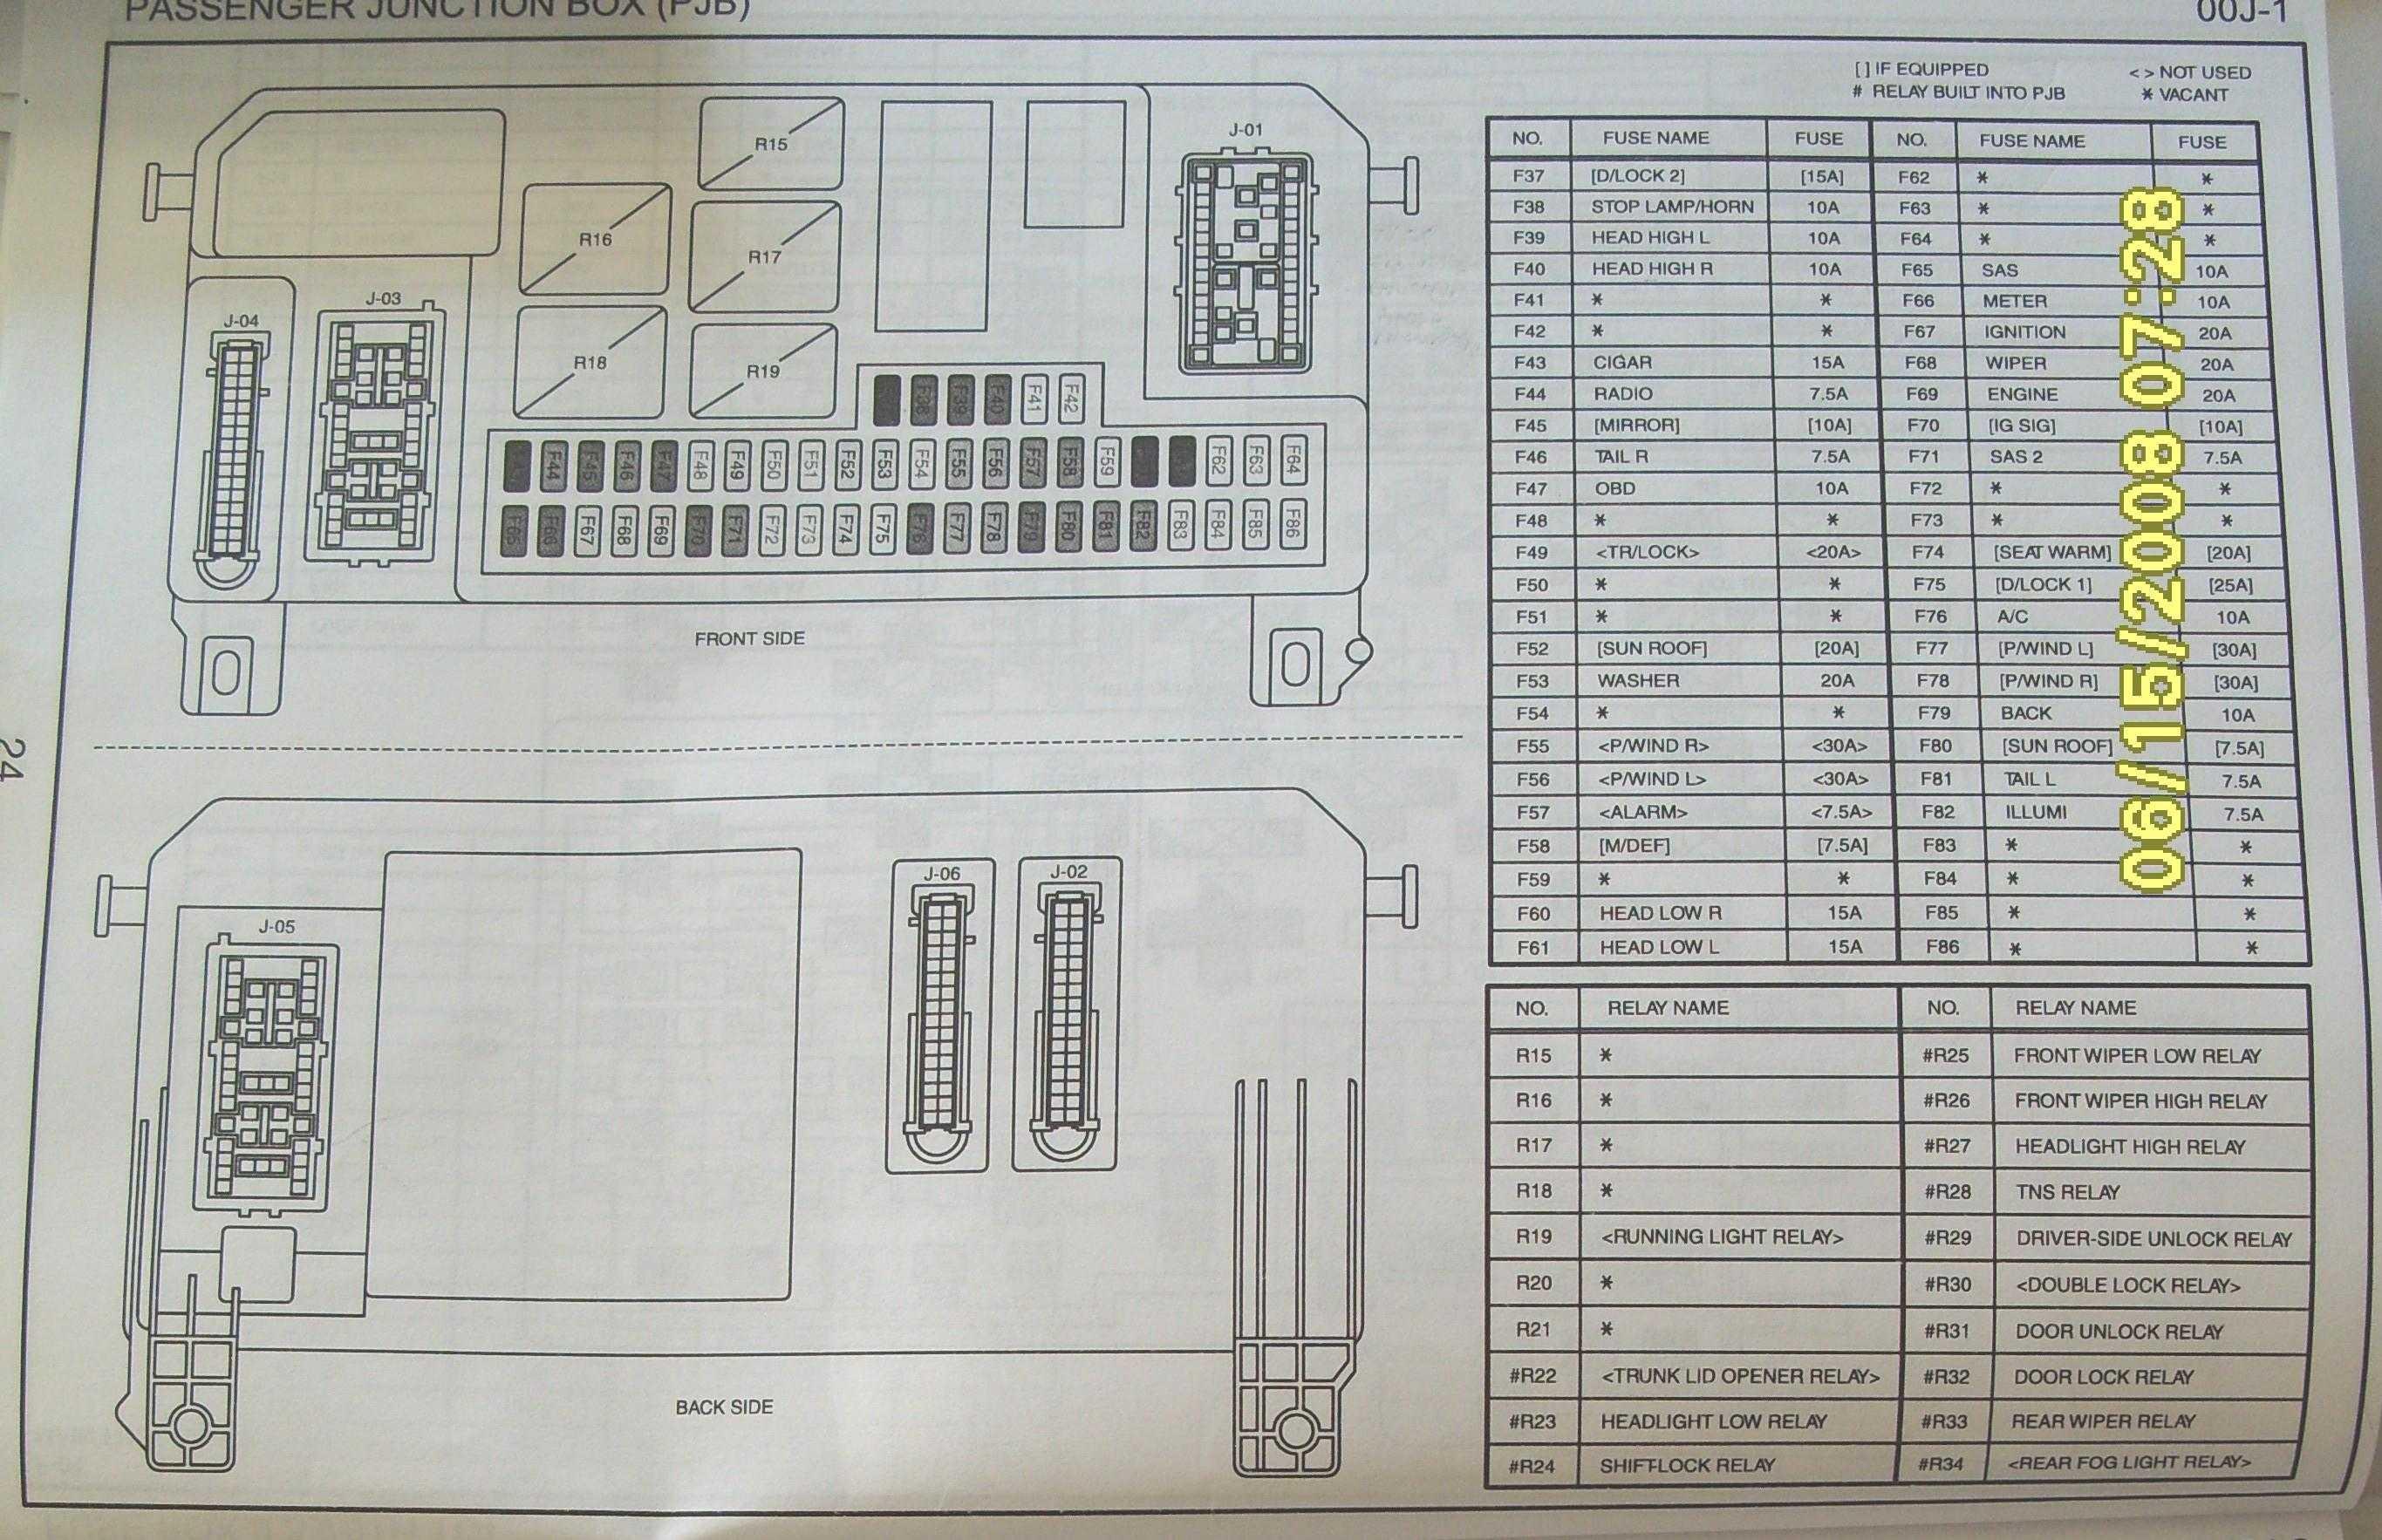 mazda 3 headlight wiring diagram wiring diagrams 8366d1276288059 headlights  horn wont shutoff wiring diagram s1050443 commented pg1 50?resize\=665